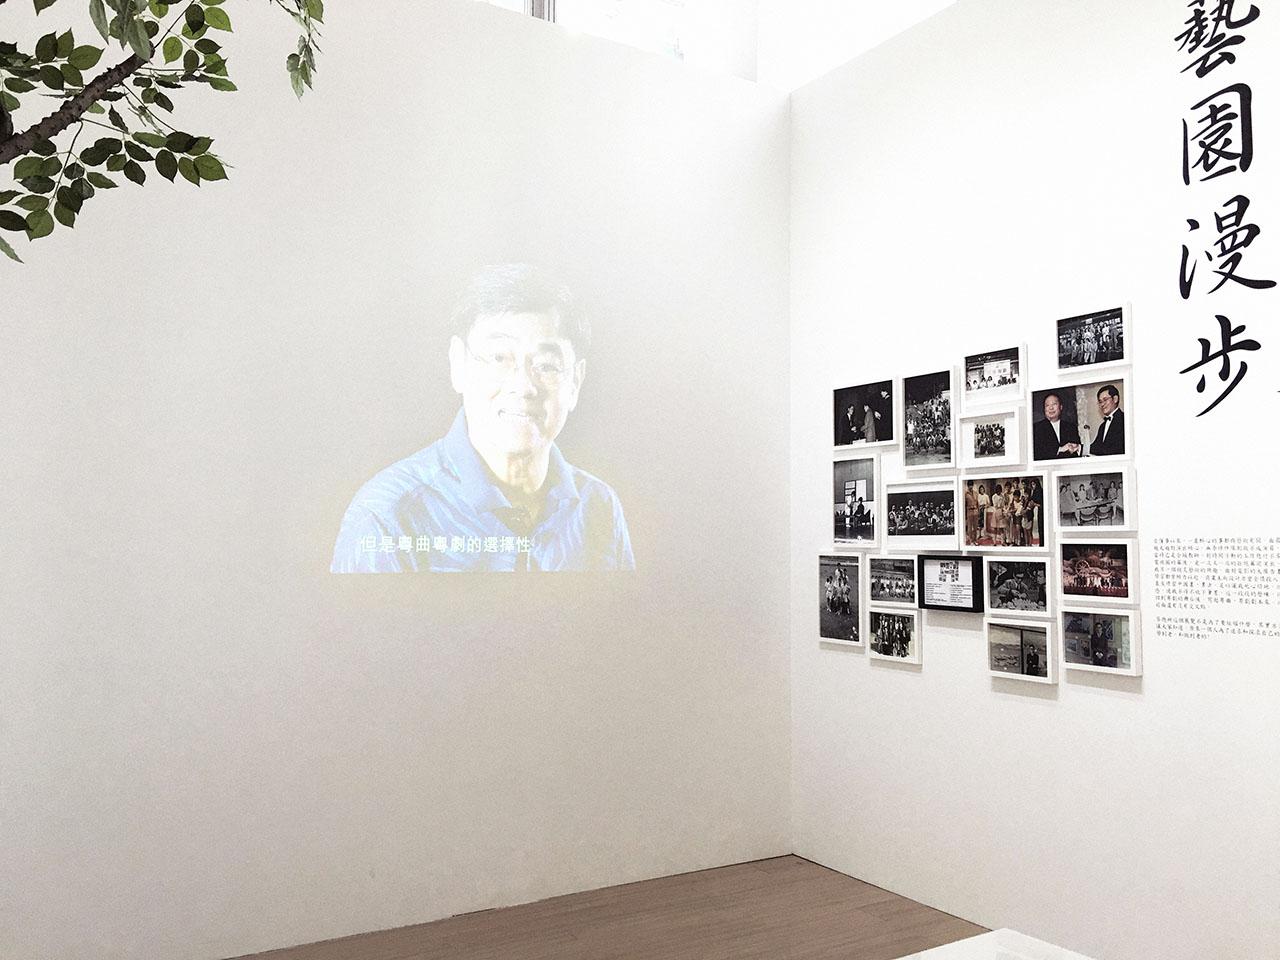 Pop-up Exhibit Lyricist Kok-Kong Cheng